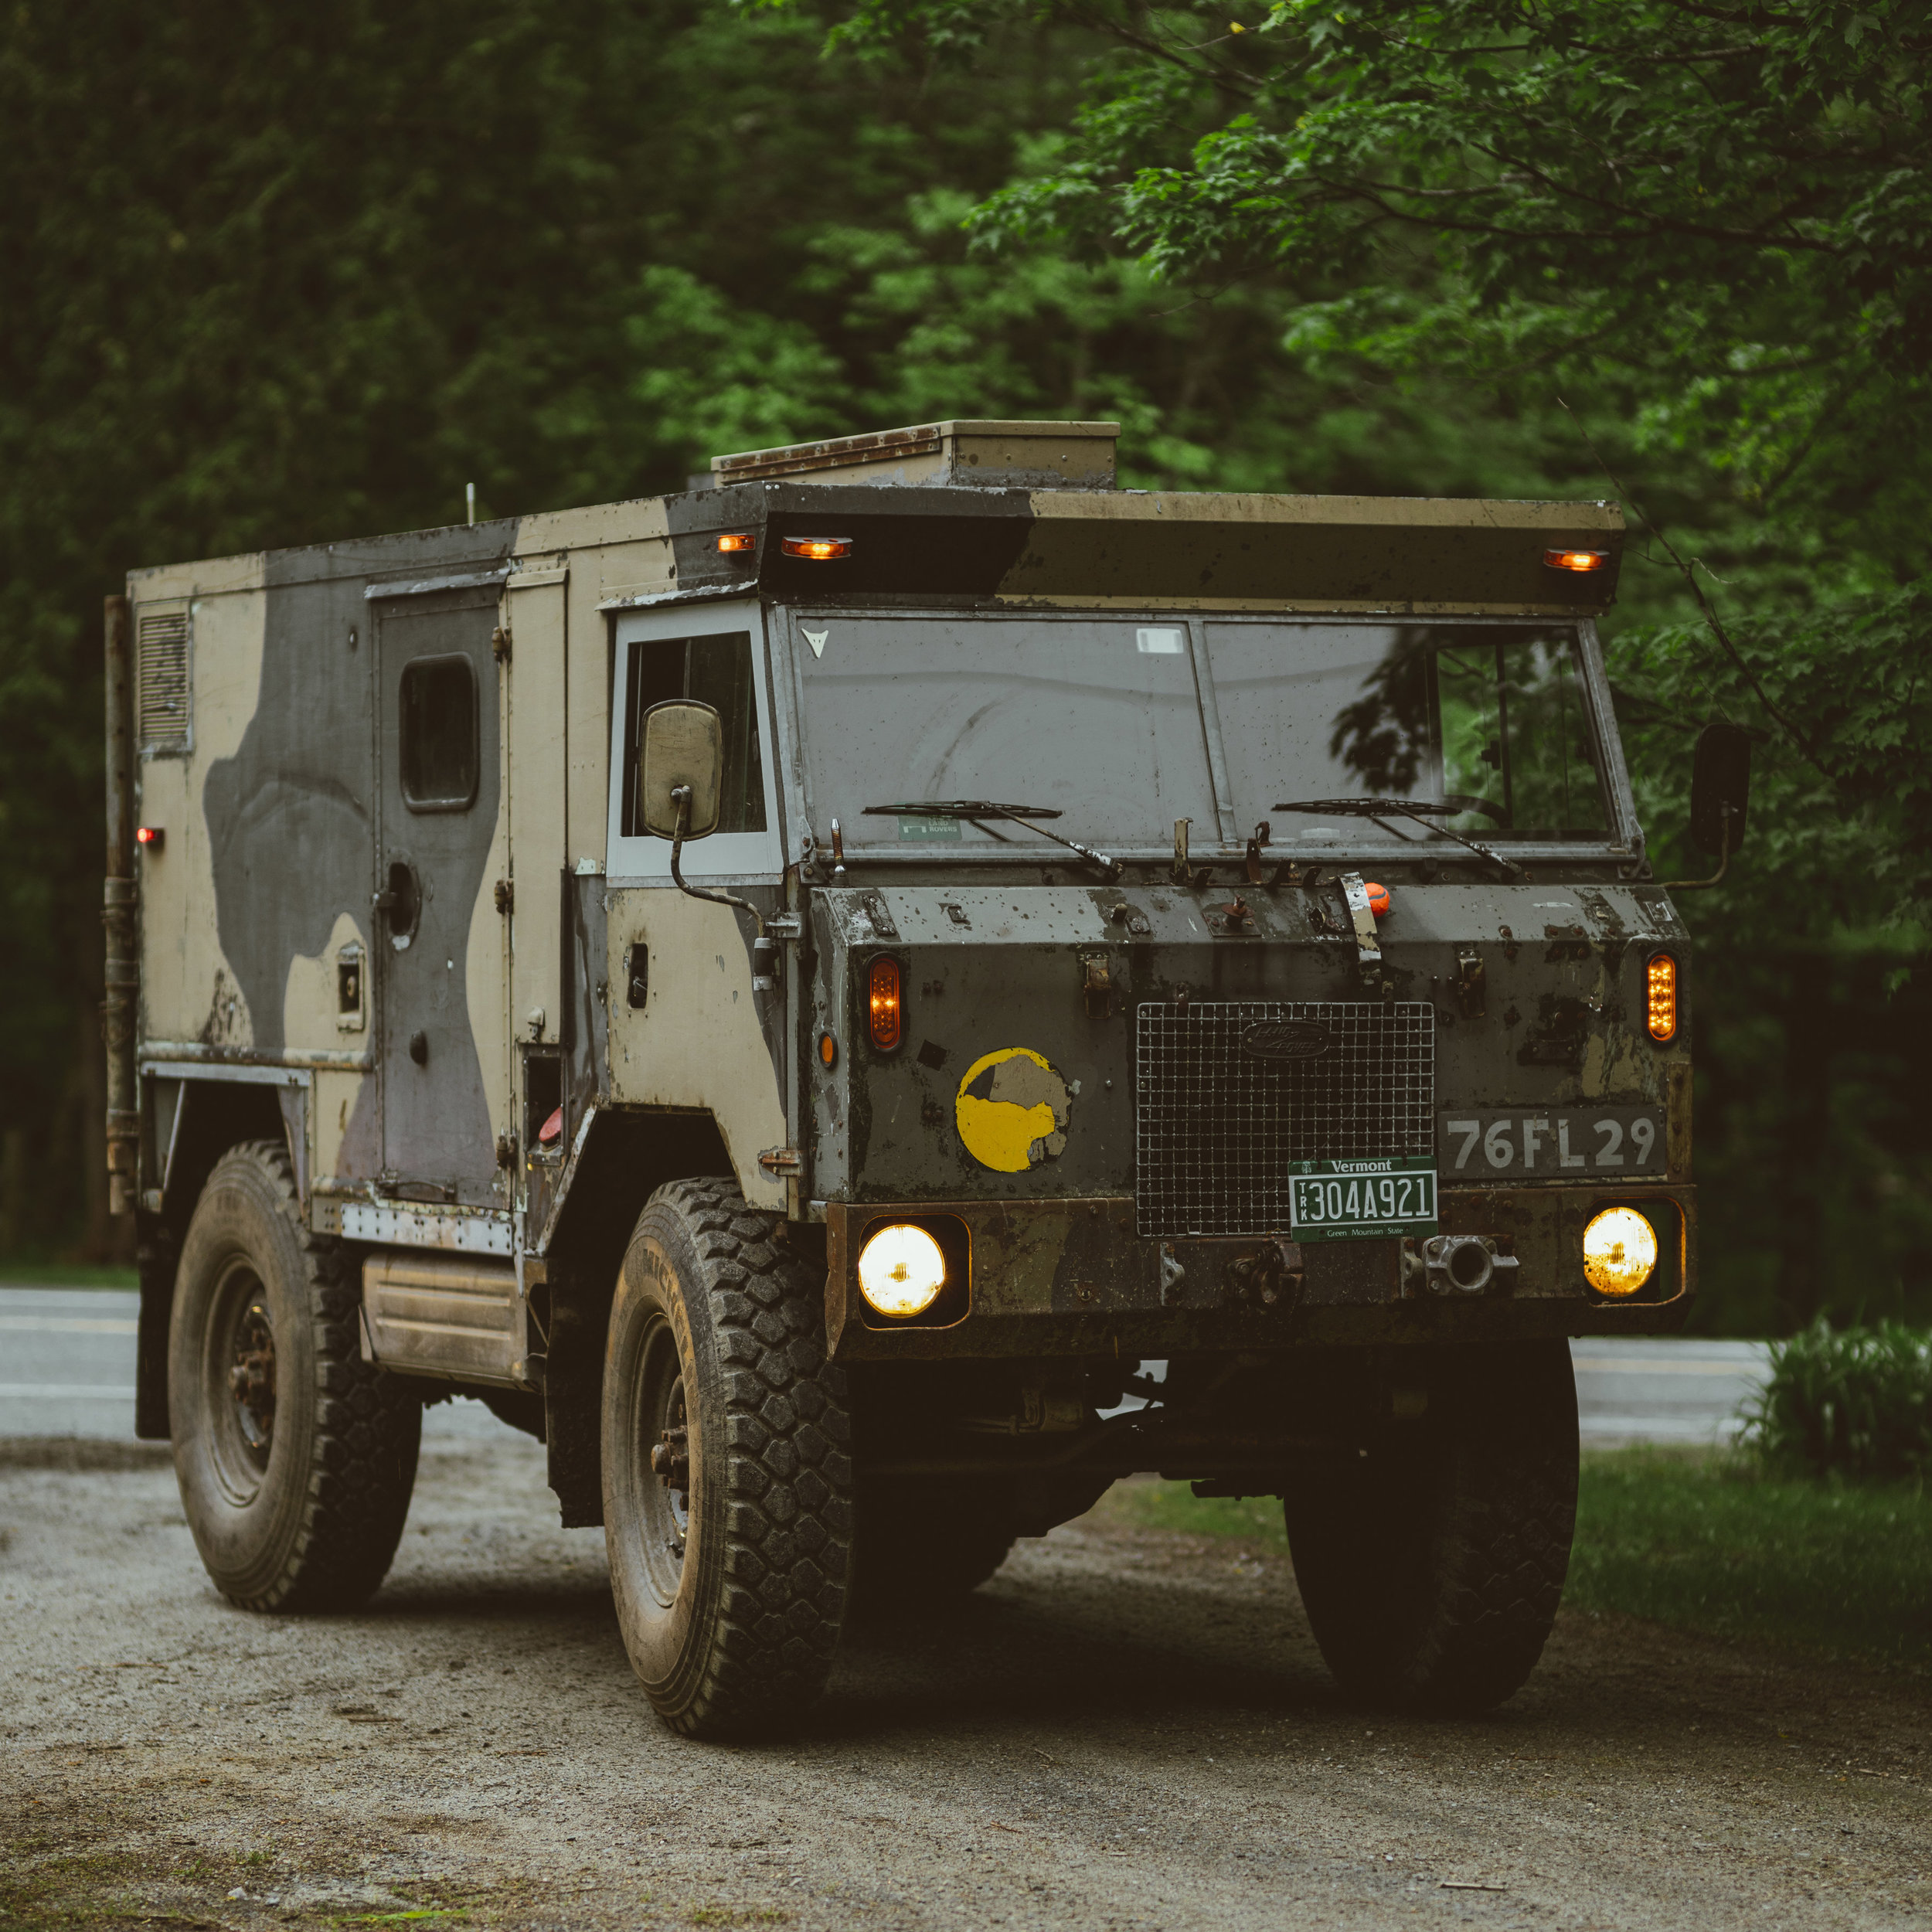 xlarge_Land_Rover_101_Forward_Control_VAMPIRE_02.jpg